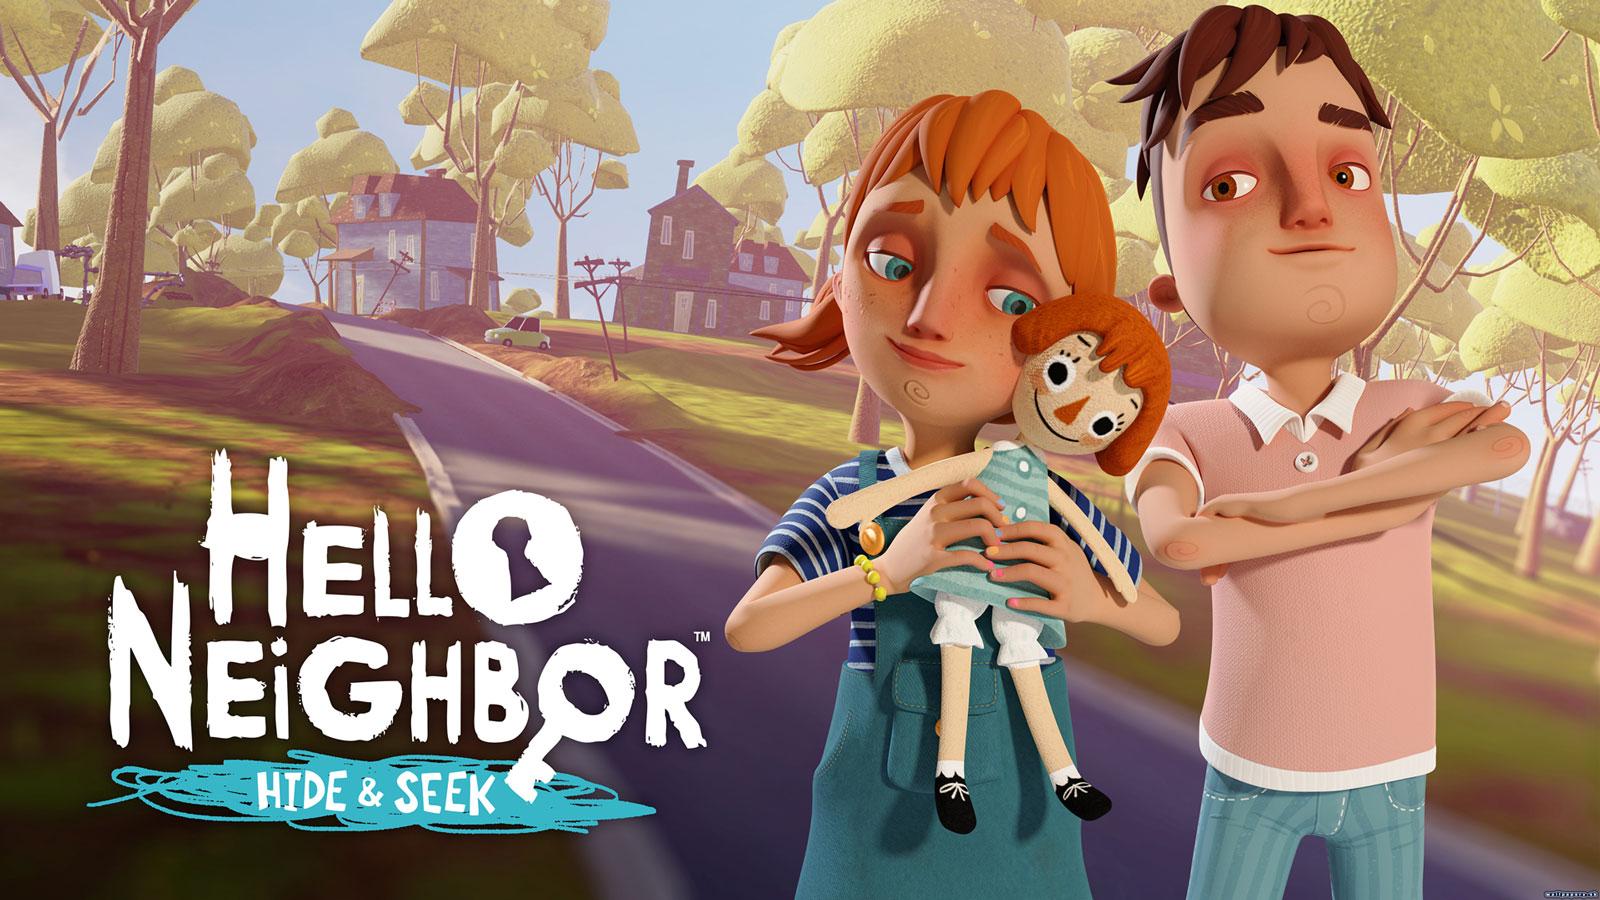 Free Hello Neighbor: Hide and Seek Wallpaper in 1600x900